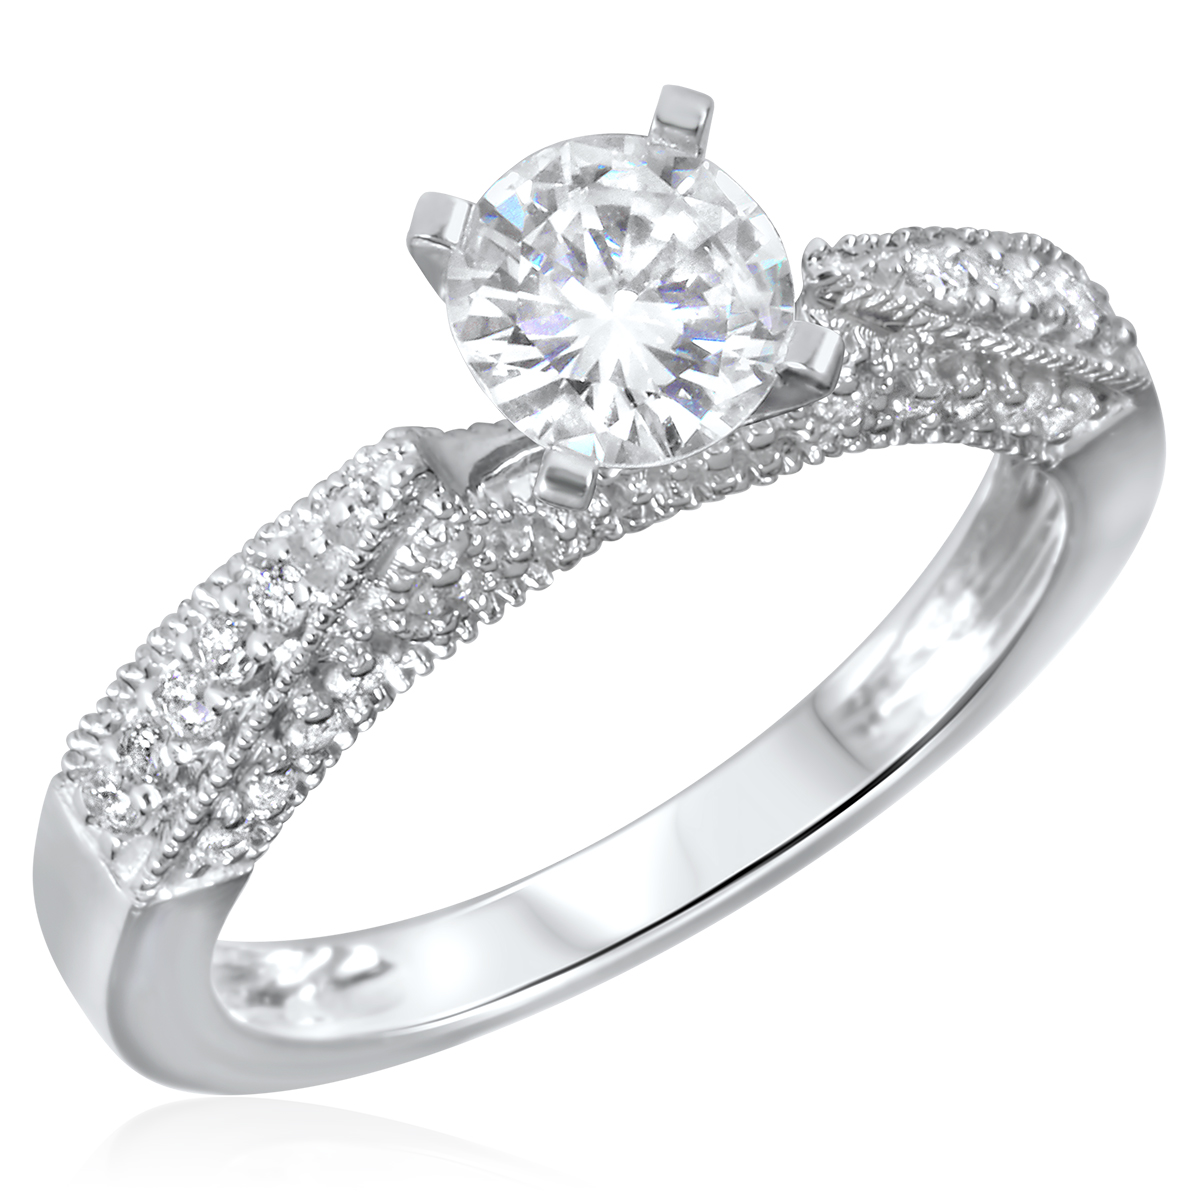 1 CT. T.W. Diamond Ladies Engagement Ring 14K White Gold- Size 8